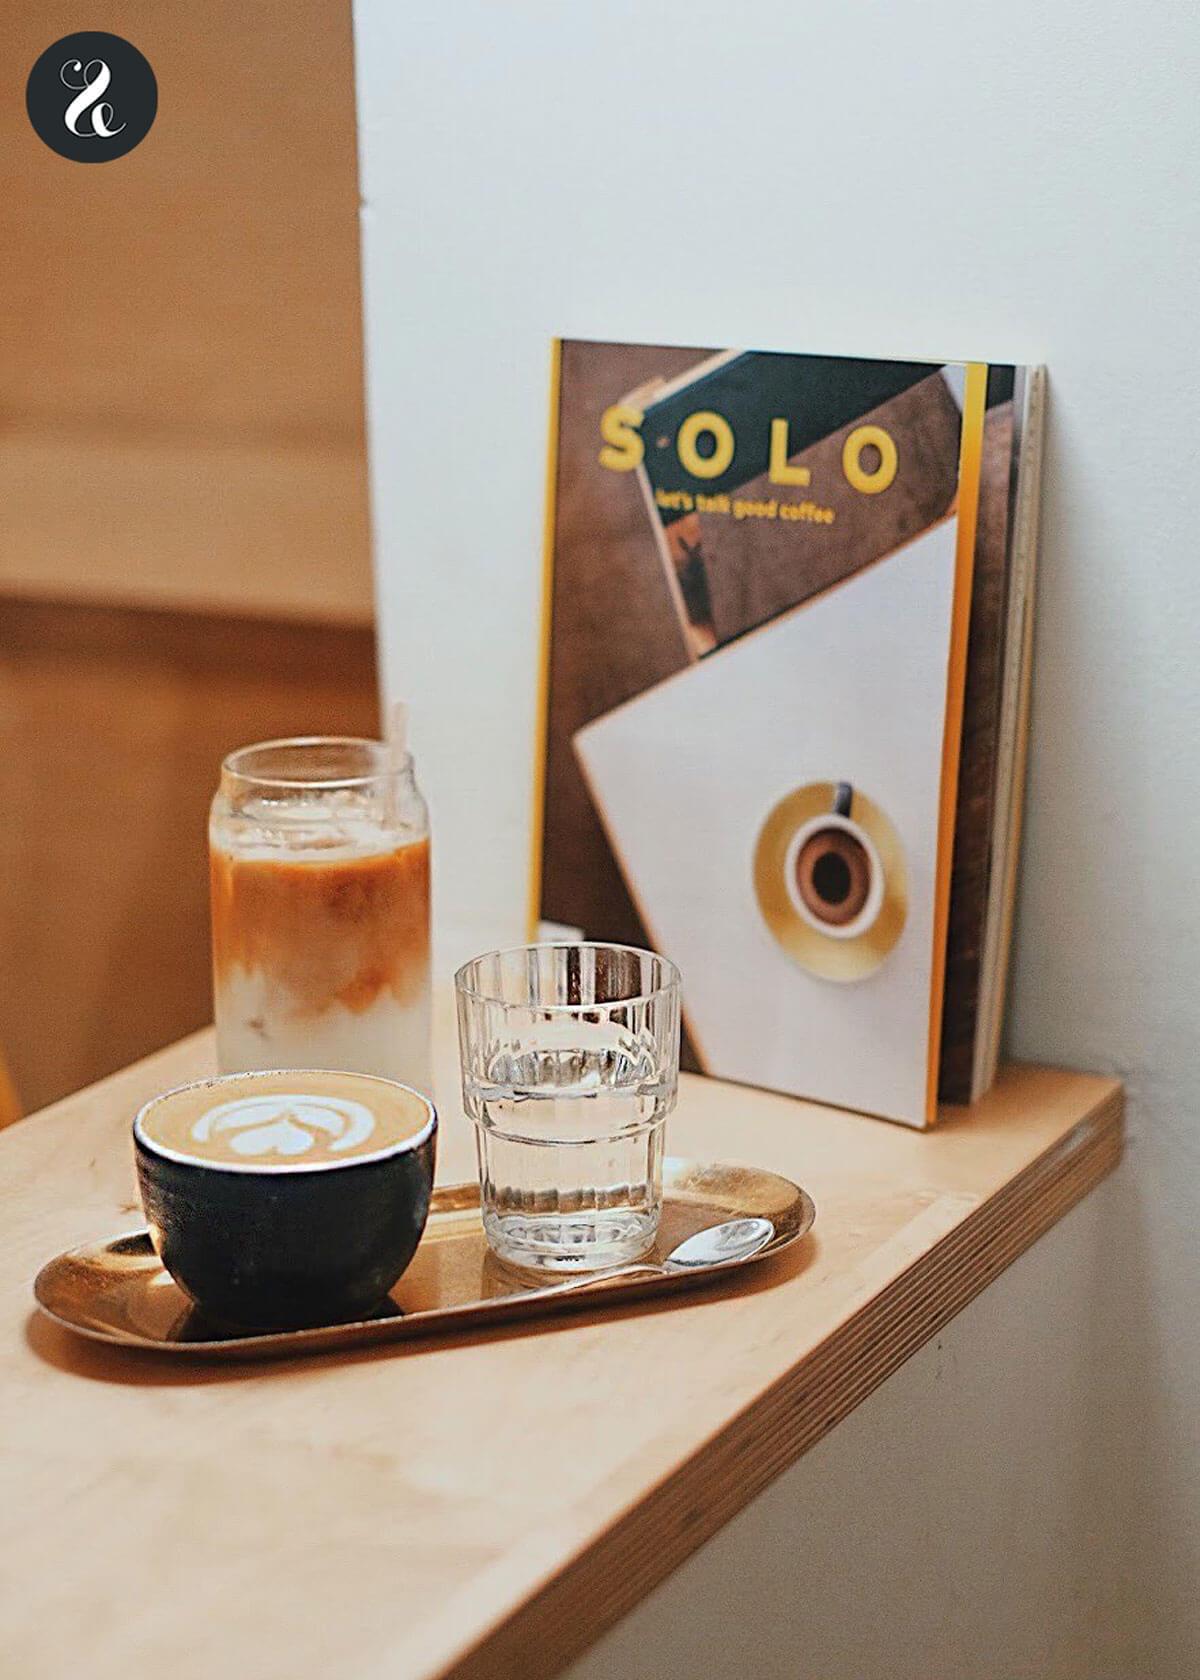 comer museo reina sofía - Hola Coffee